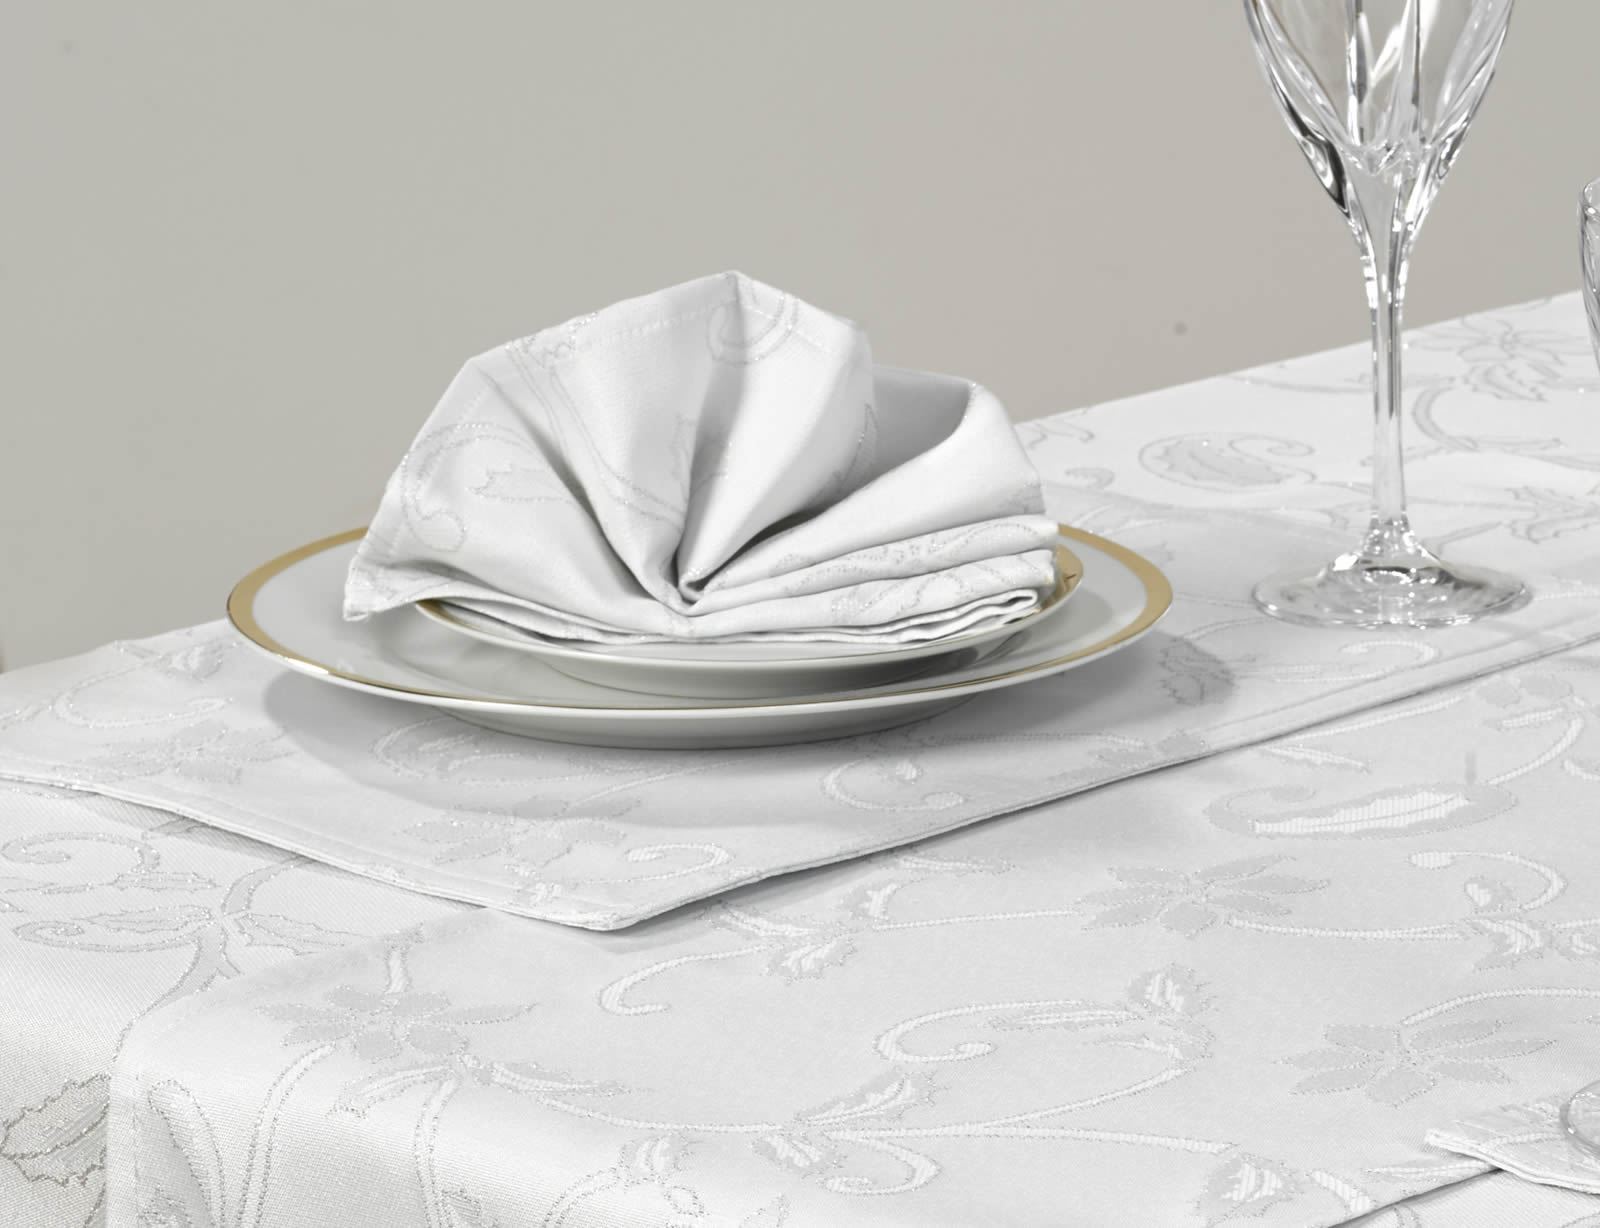 14-Piece-Christmas-Table-Linen-Set-Cloth-Napkins-  sc 1 st  eBay & Details about 14 Piece Christmas Table Linen Set Cloth Napkins Runner Placemats 52